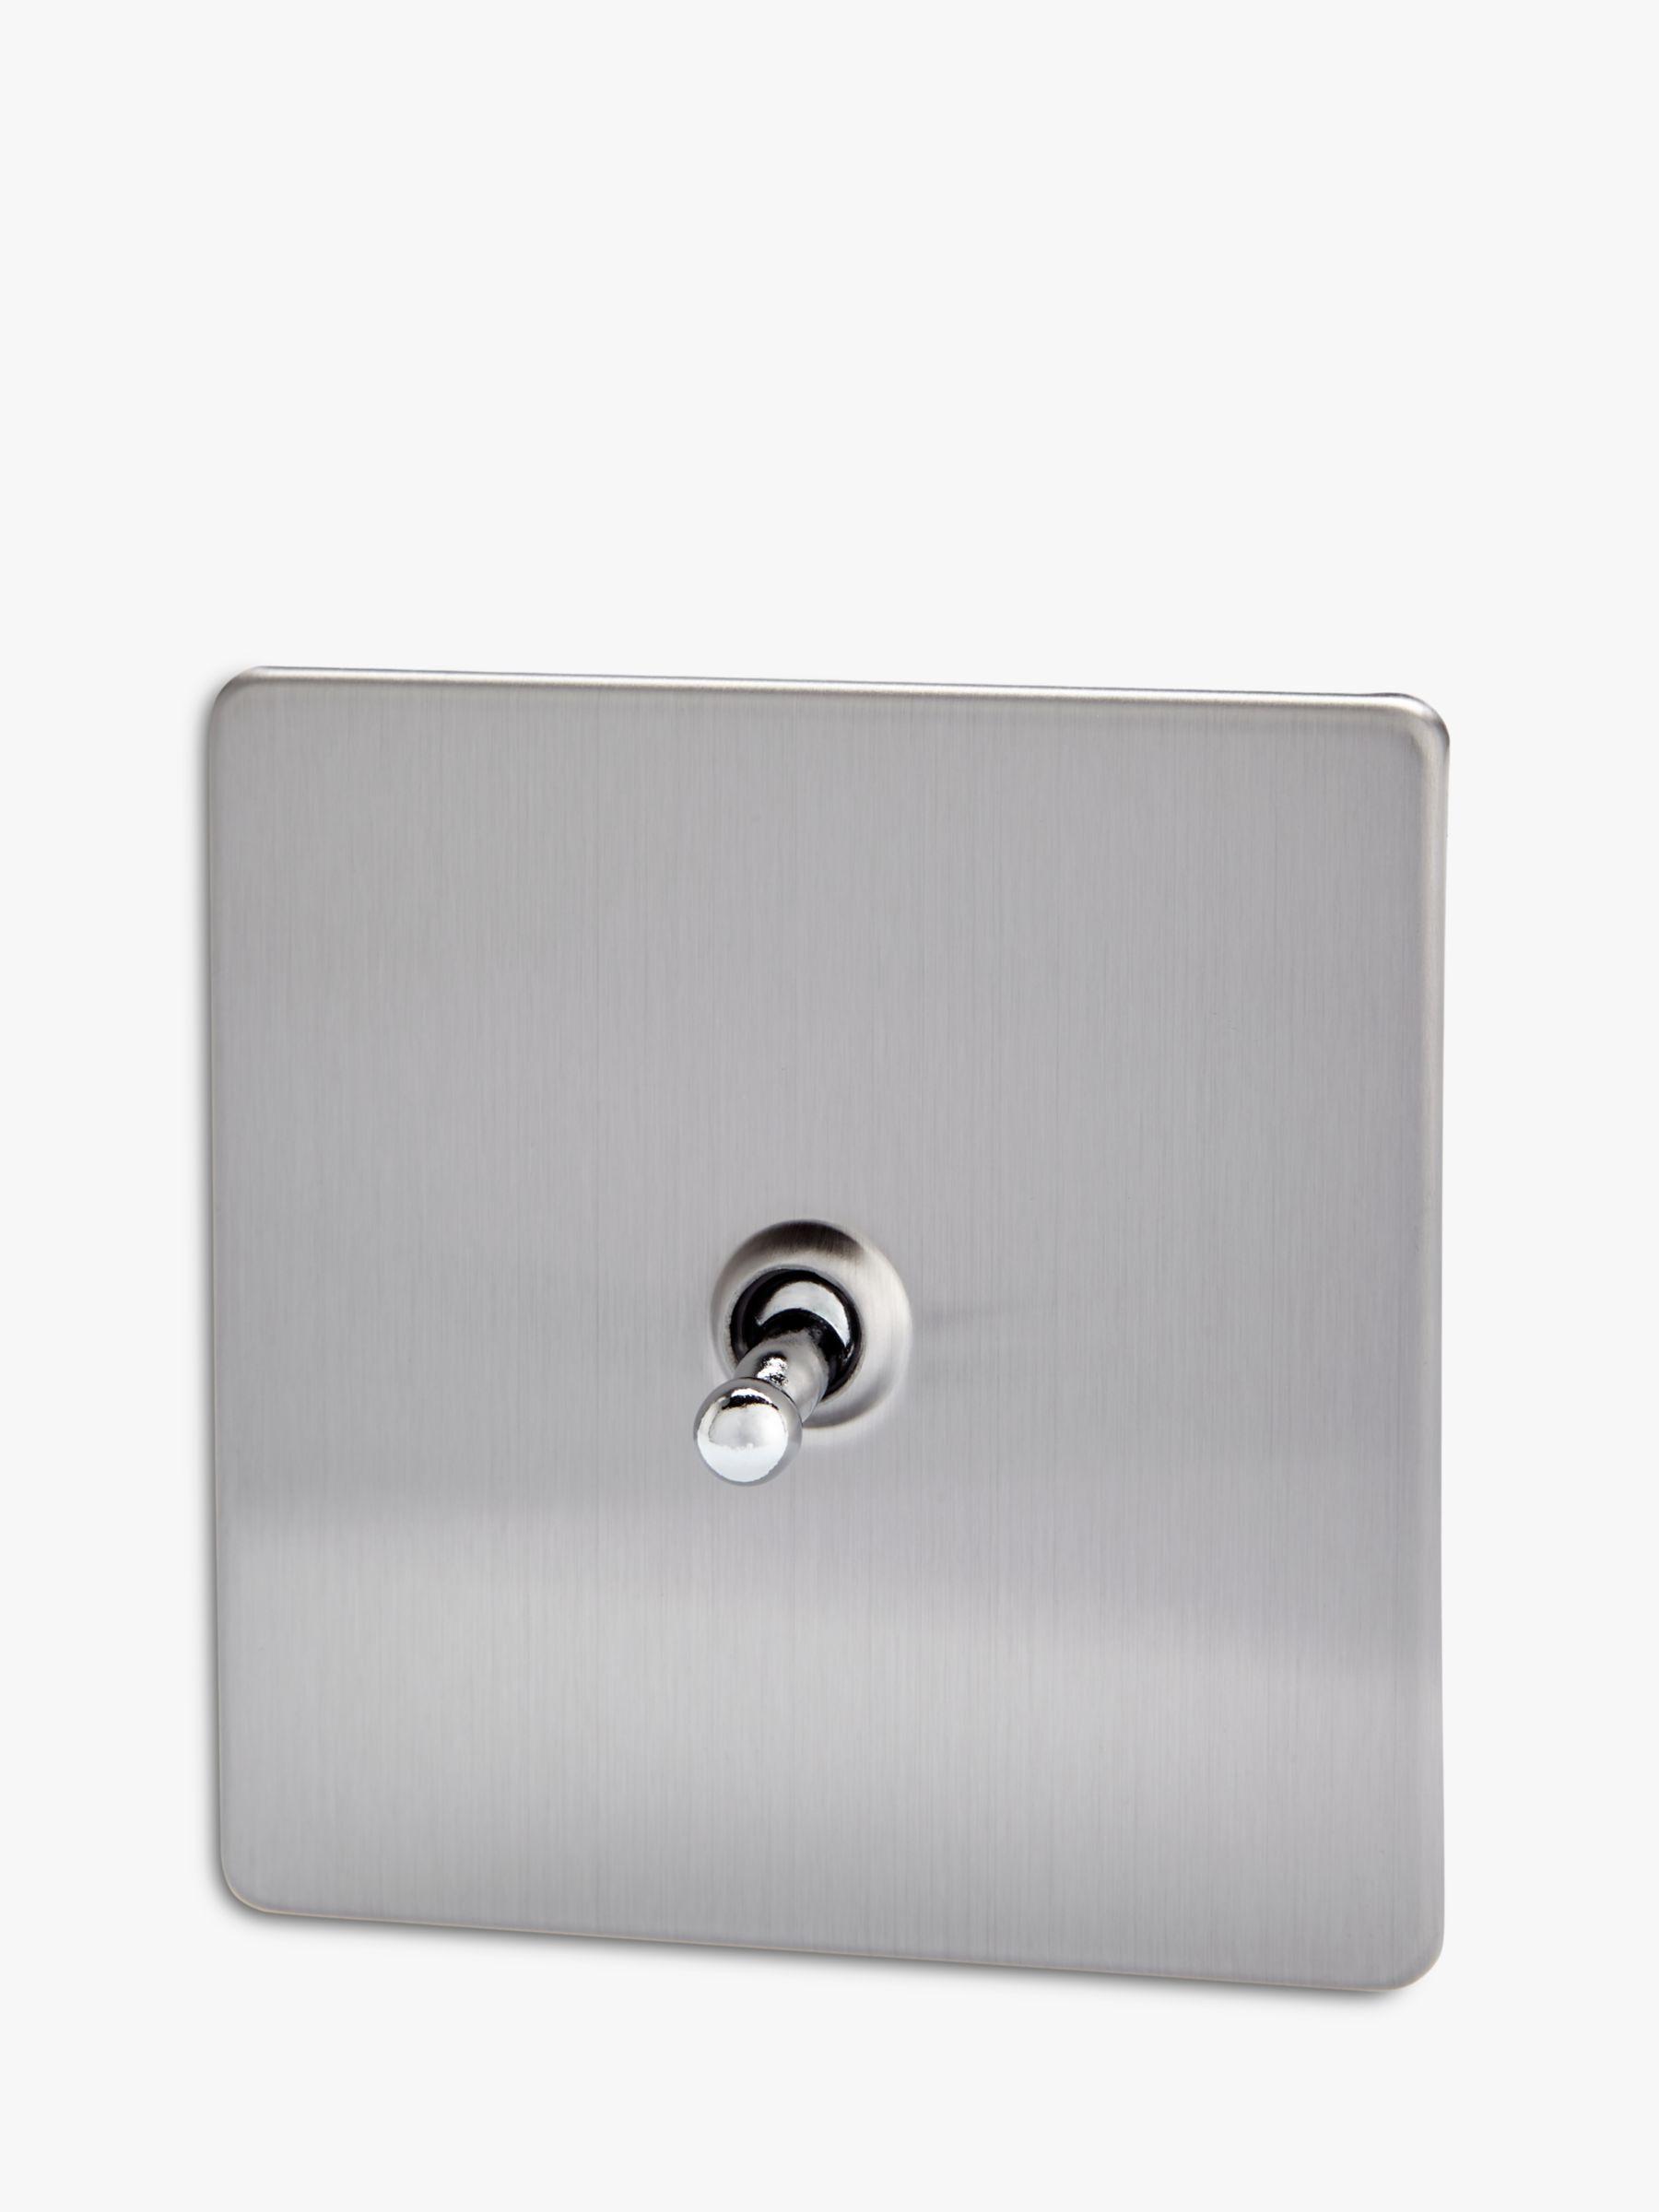 Varilight Varilight 1 Gang 2-Way Toggle Switch, Brushed Steel